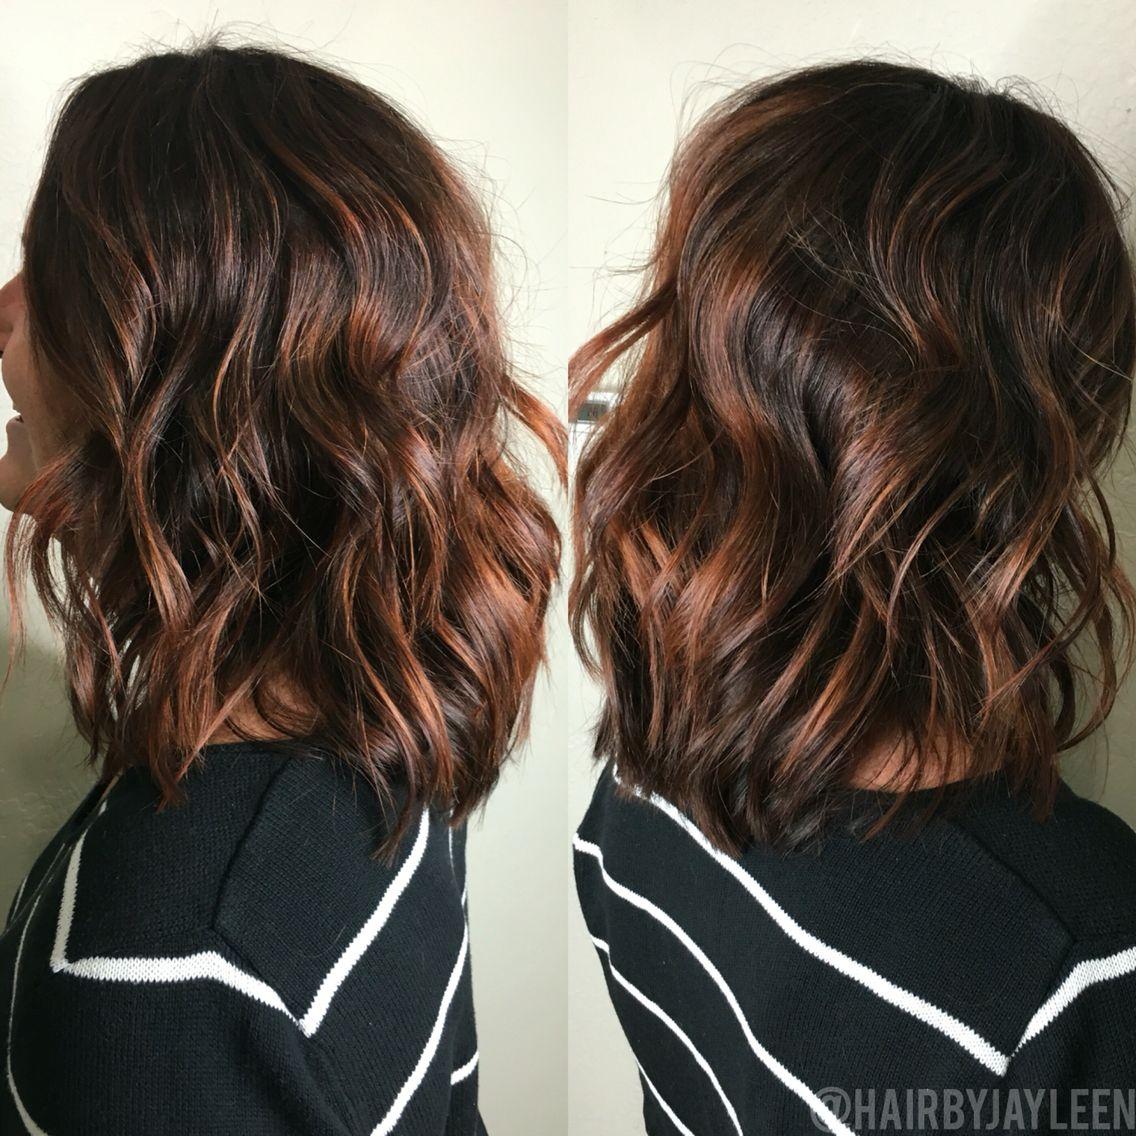 Balayage brown hair, balayage dark hair, brunette hair, copper balayage, lob, short hairstyles, textured lob, caramel balayage, chocolate red hair, highlights, hair painting